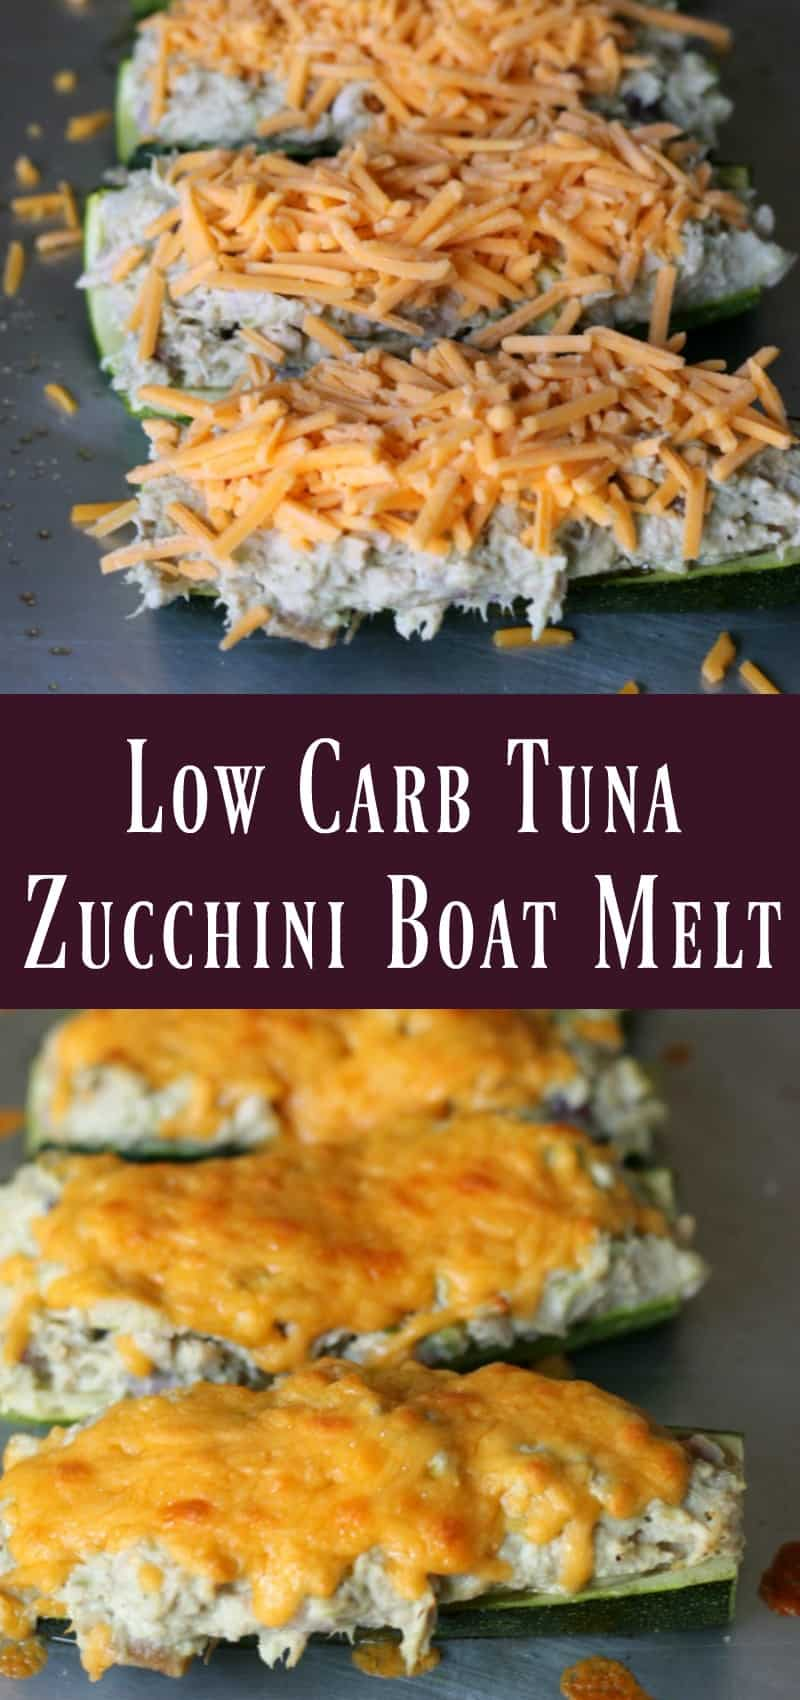 Low Carb Tuna Zucchini Boat Melt Organize Yourself Skinny